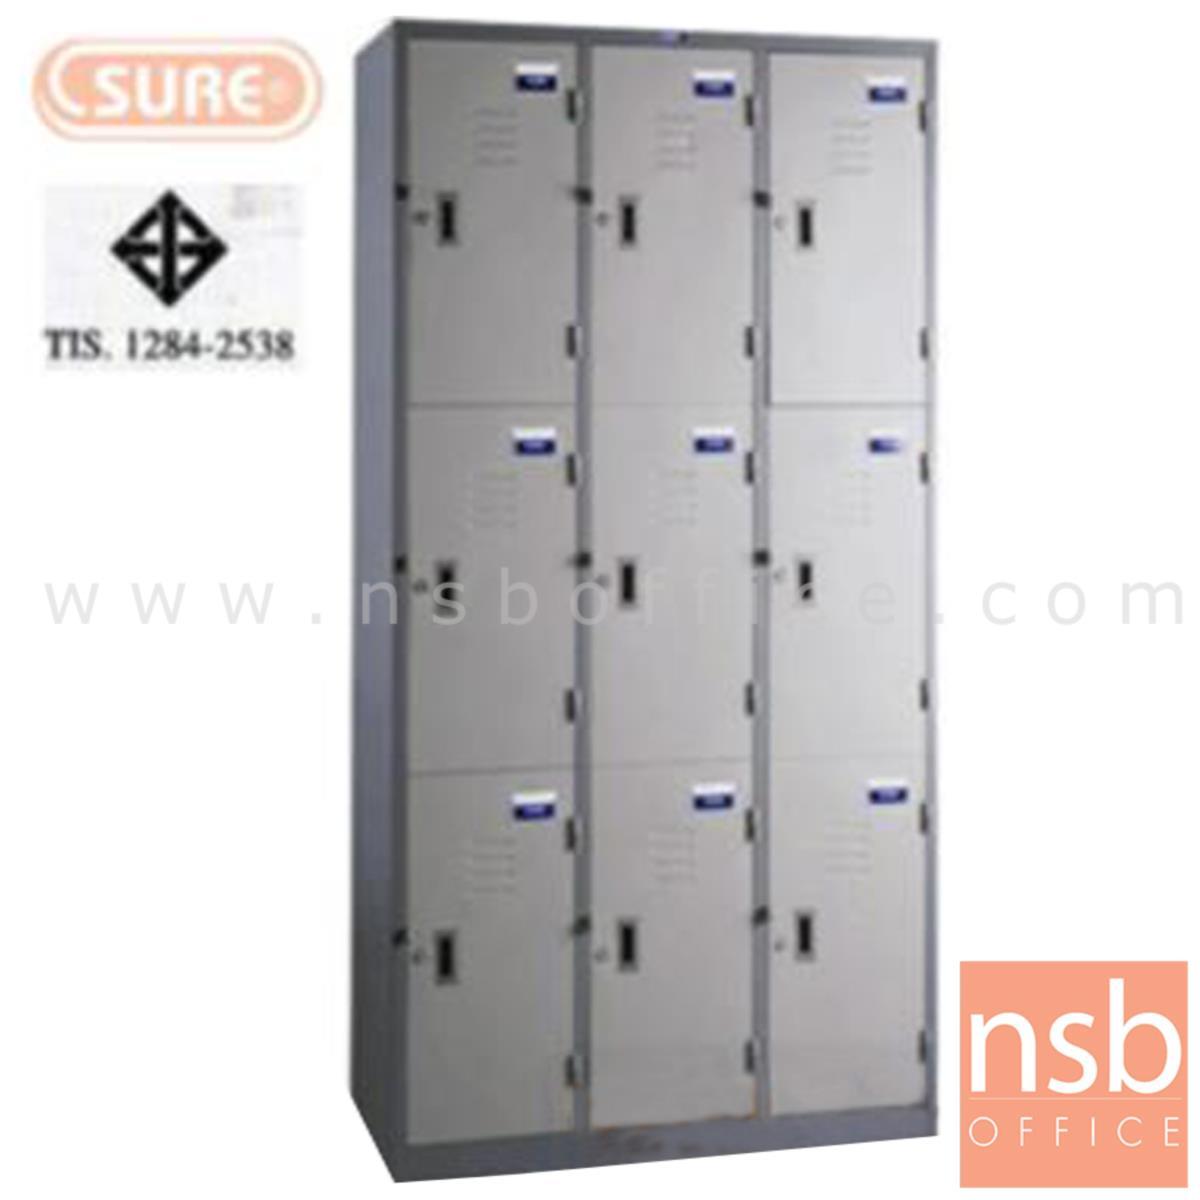 E04A021:ตู้ล็อกเกอร์ 9 ประตู มี มอก. รุ่น LK-009